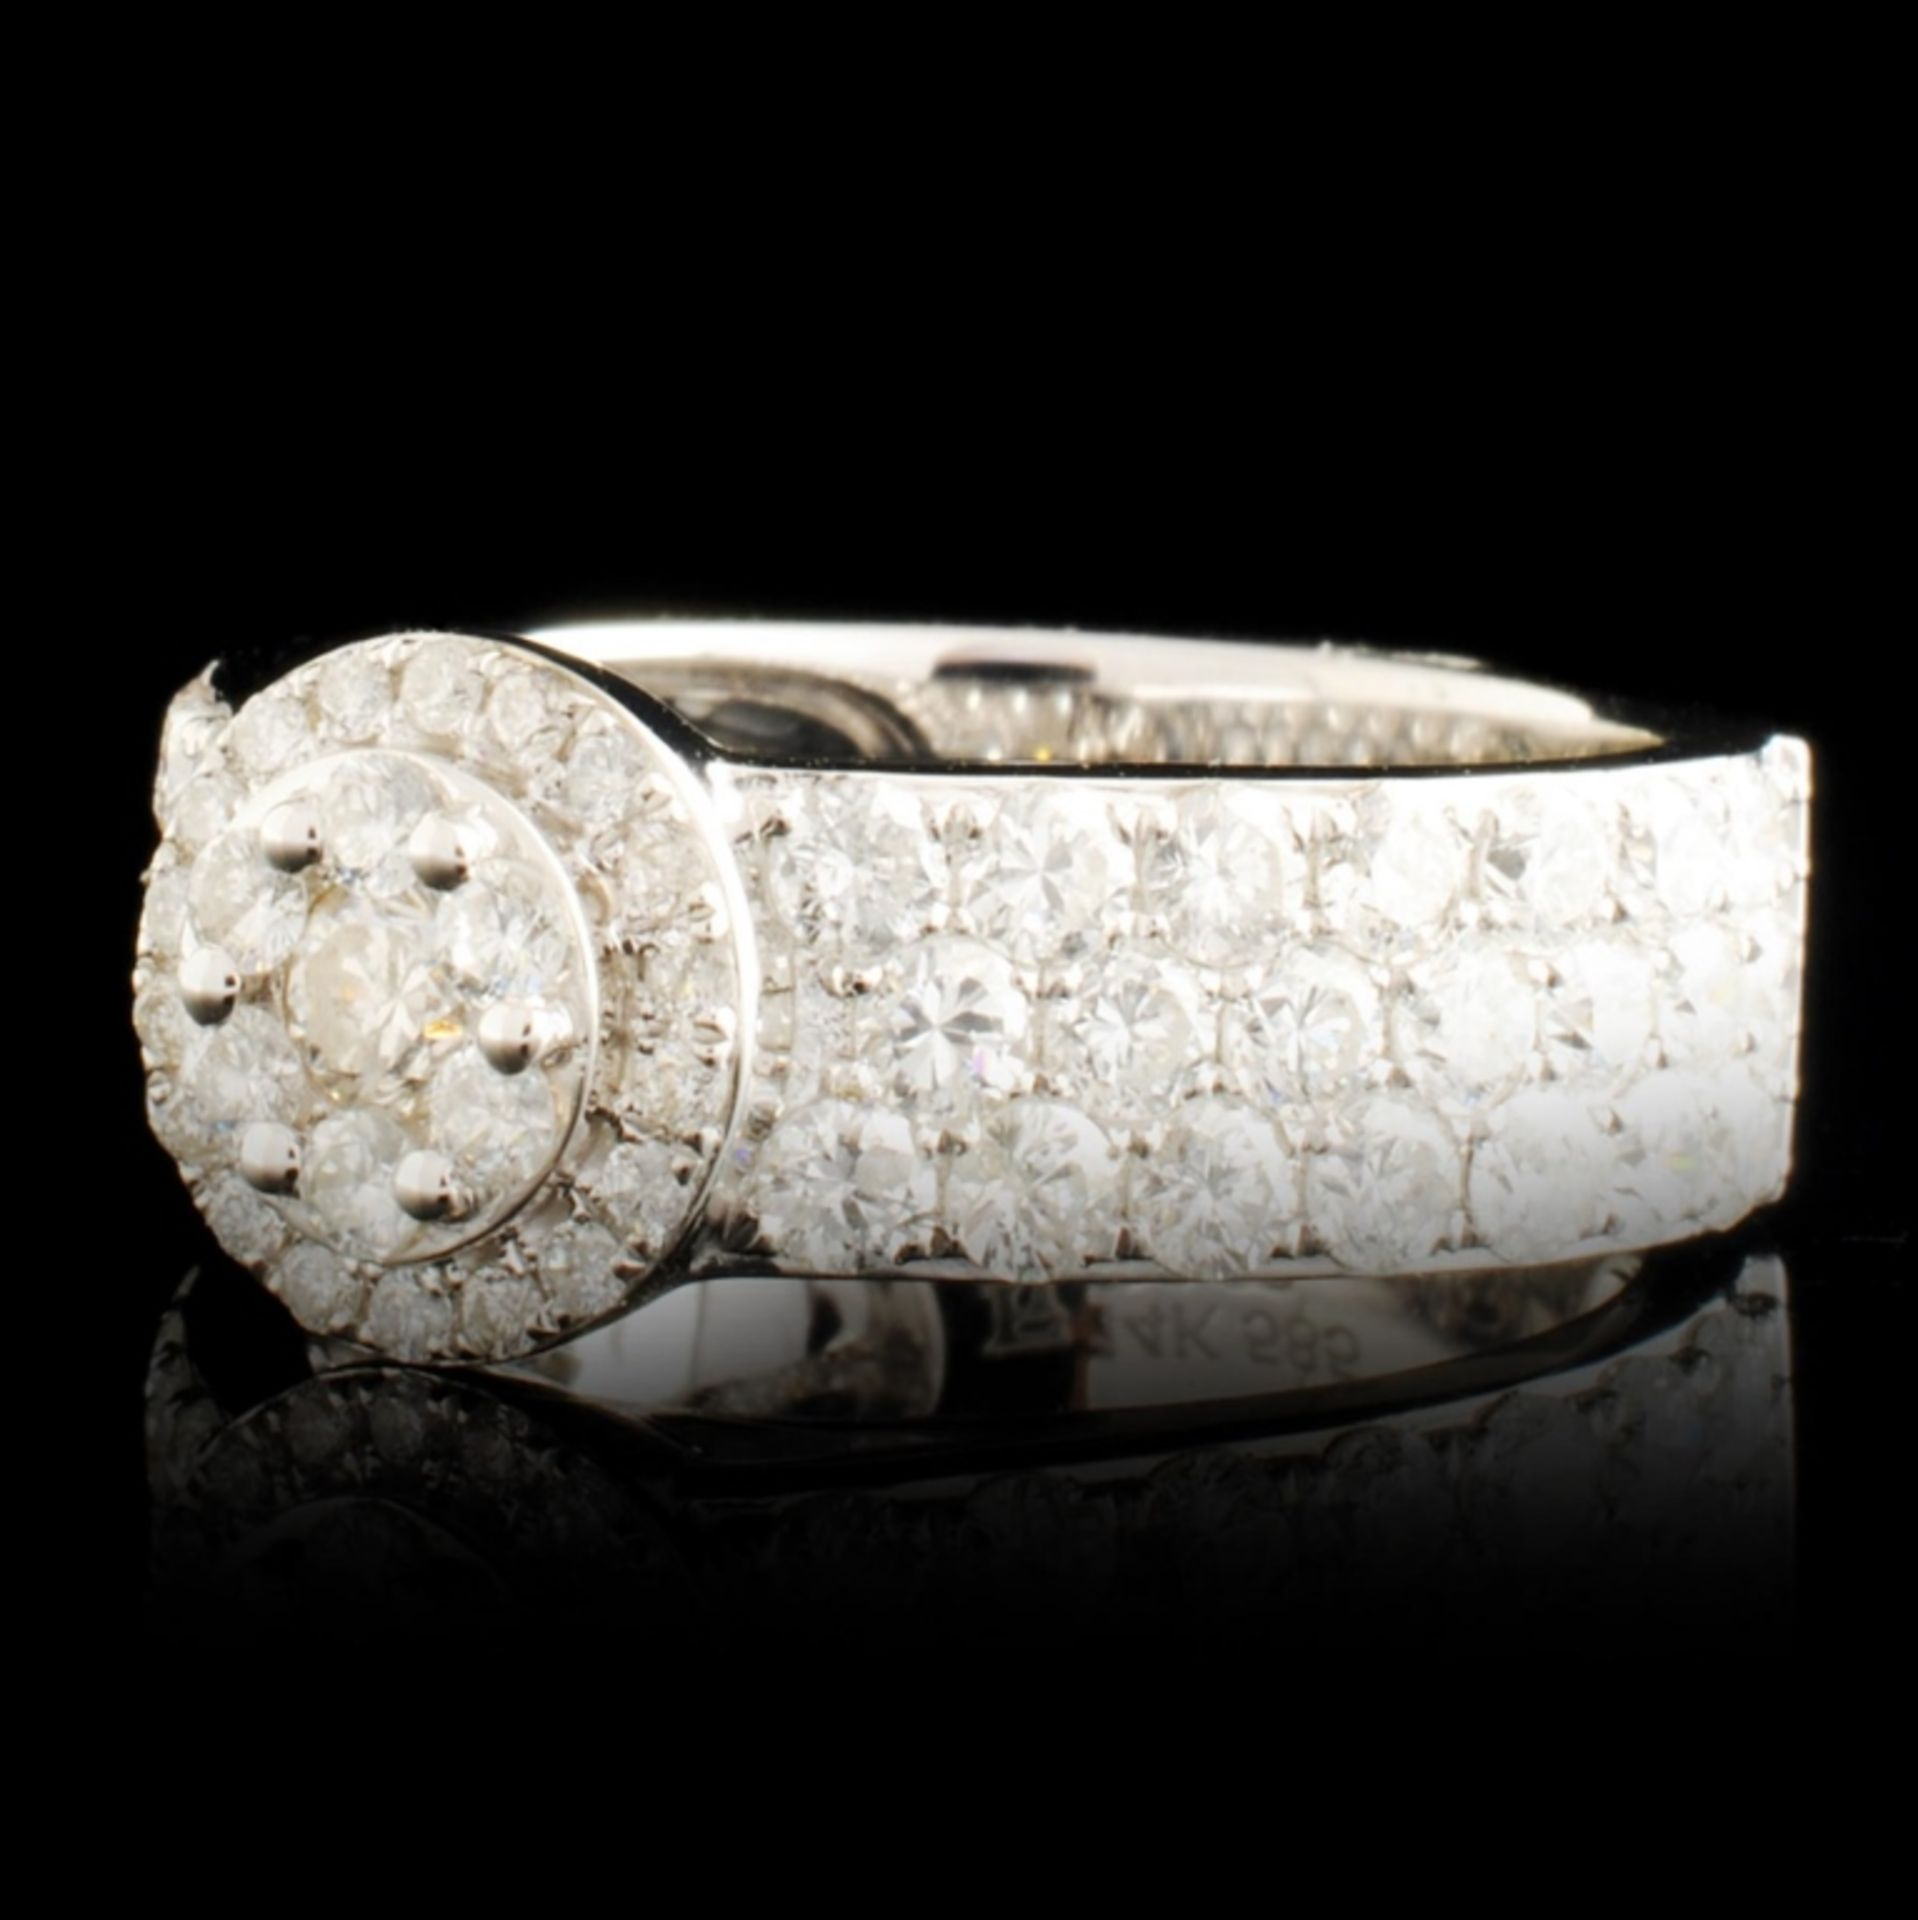 14K Gold 2.39ctw Diamond Ring - Image 2 of 5